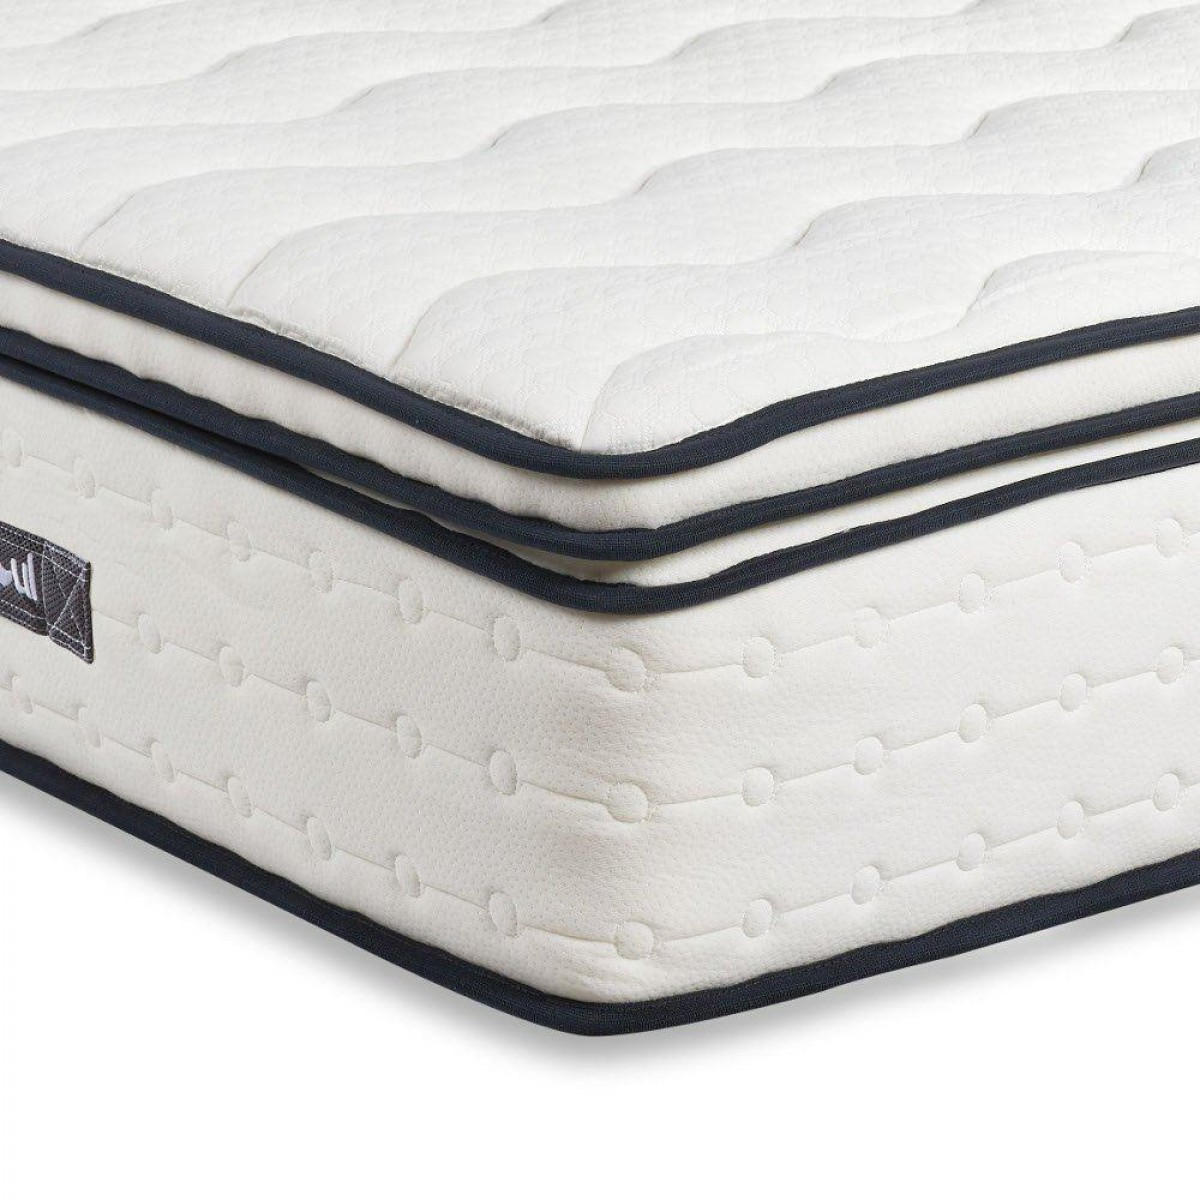 Sleep Soul Space 2000 Pocket Spring Pillowtop Mattress